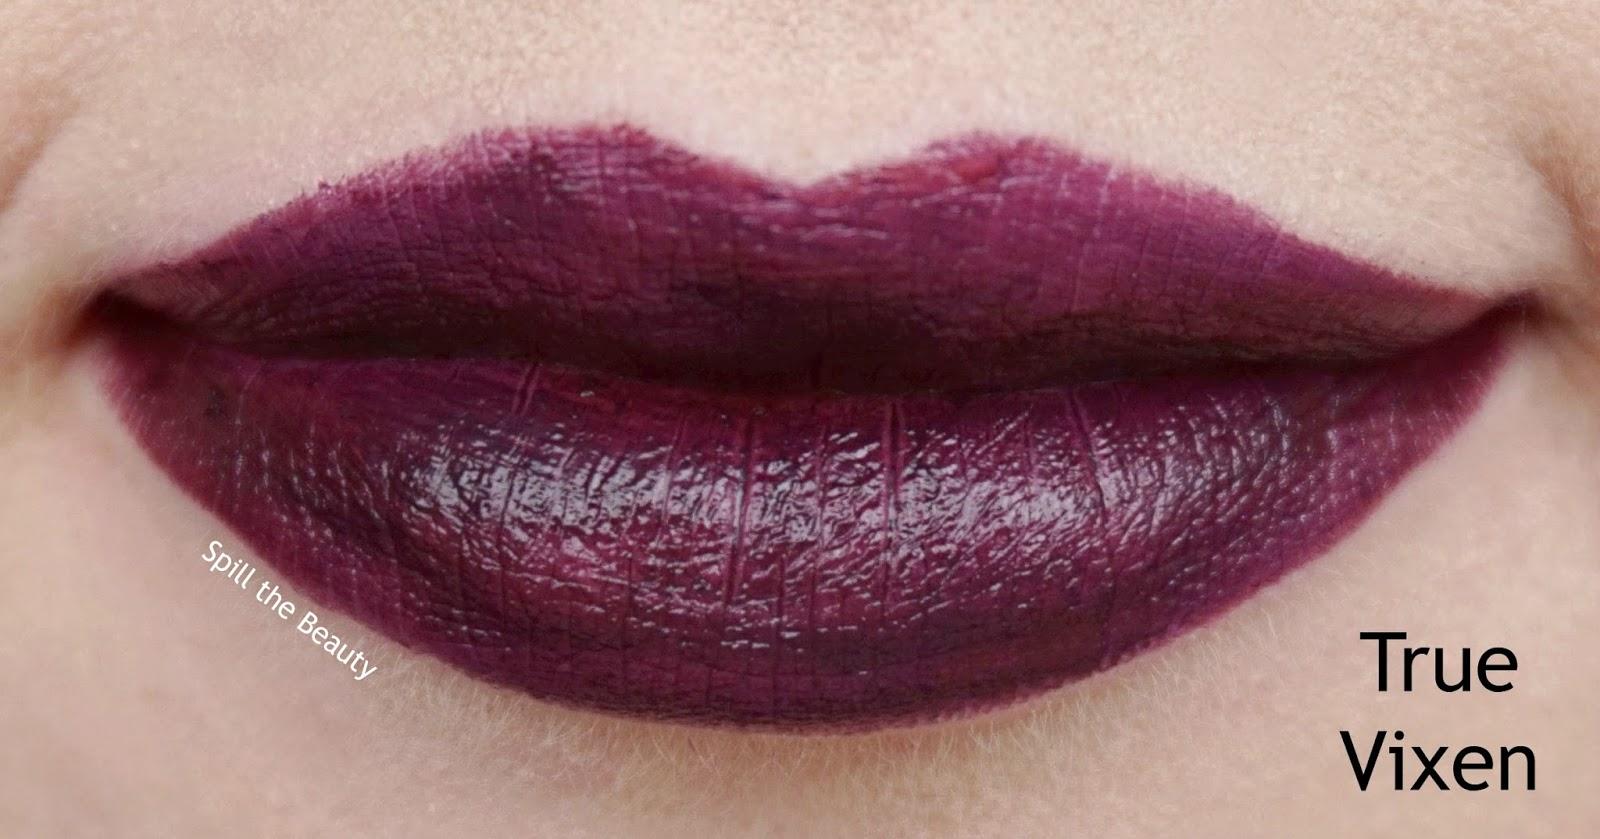 nyx pin up pout lipstick review swatches true vixen